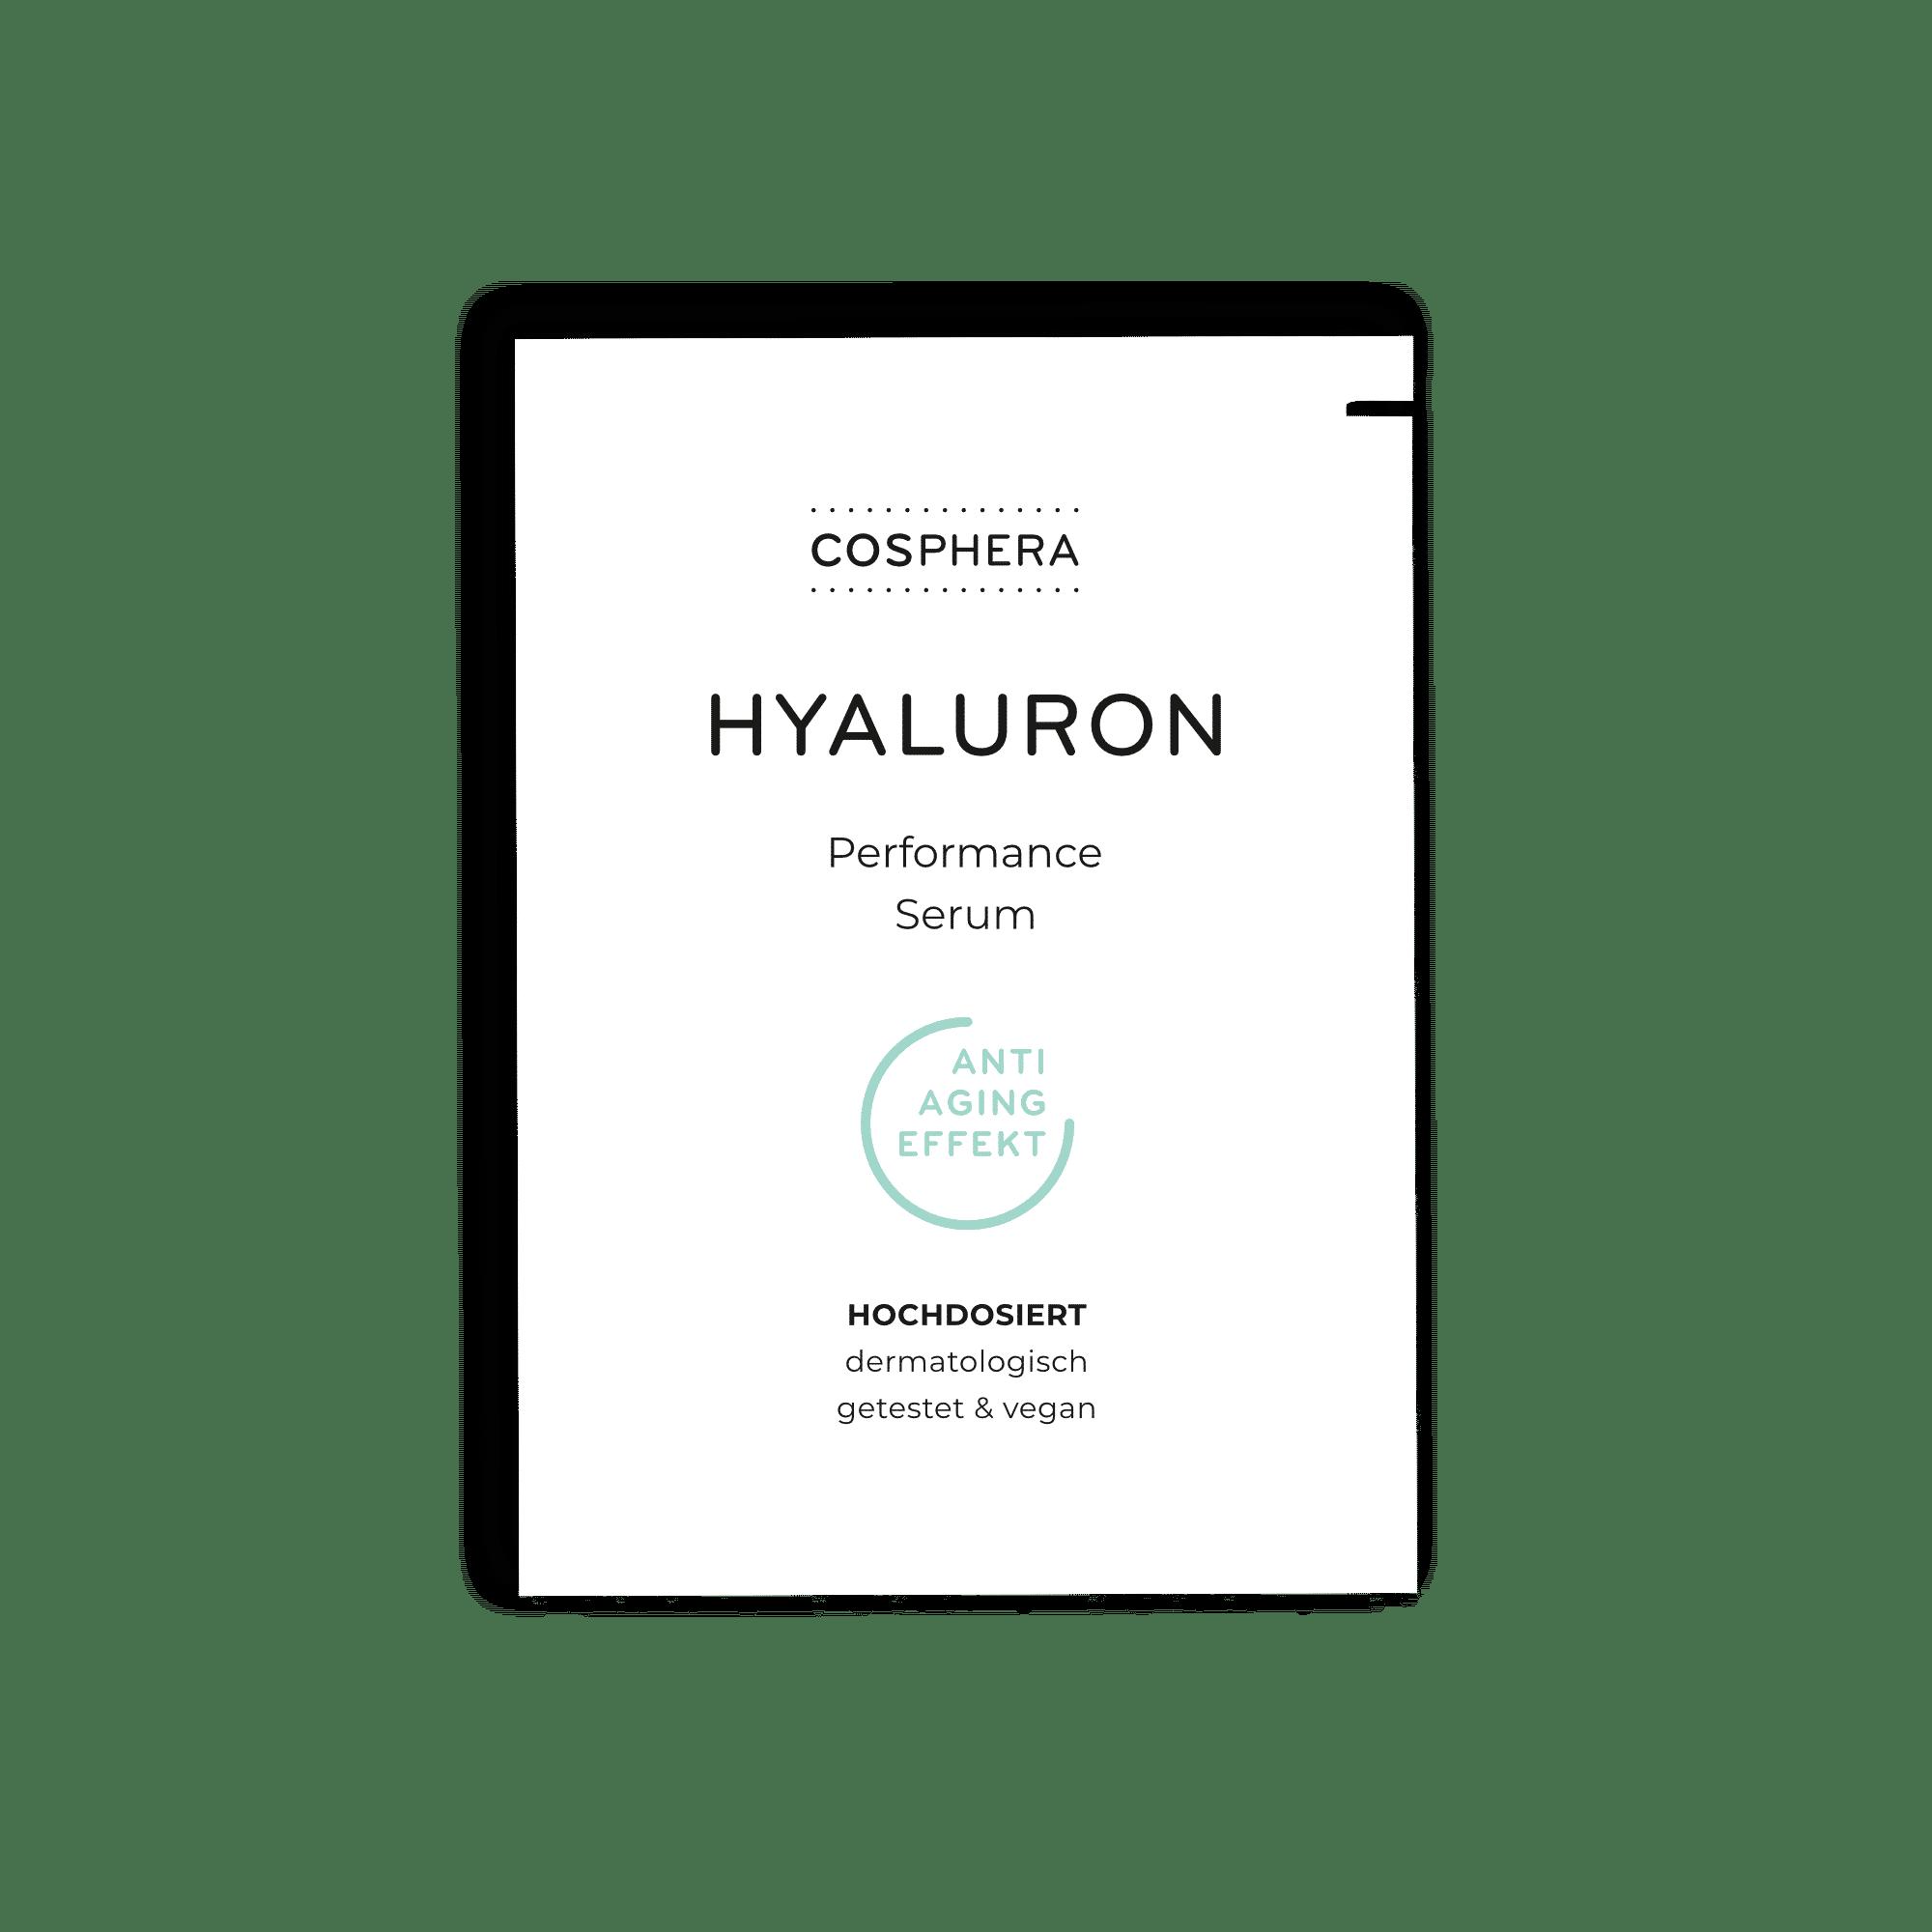 Hyaluron Performance Serum Probe (2-ml Sachet)